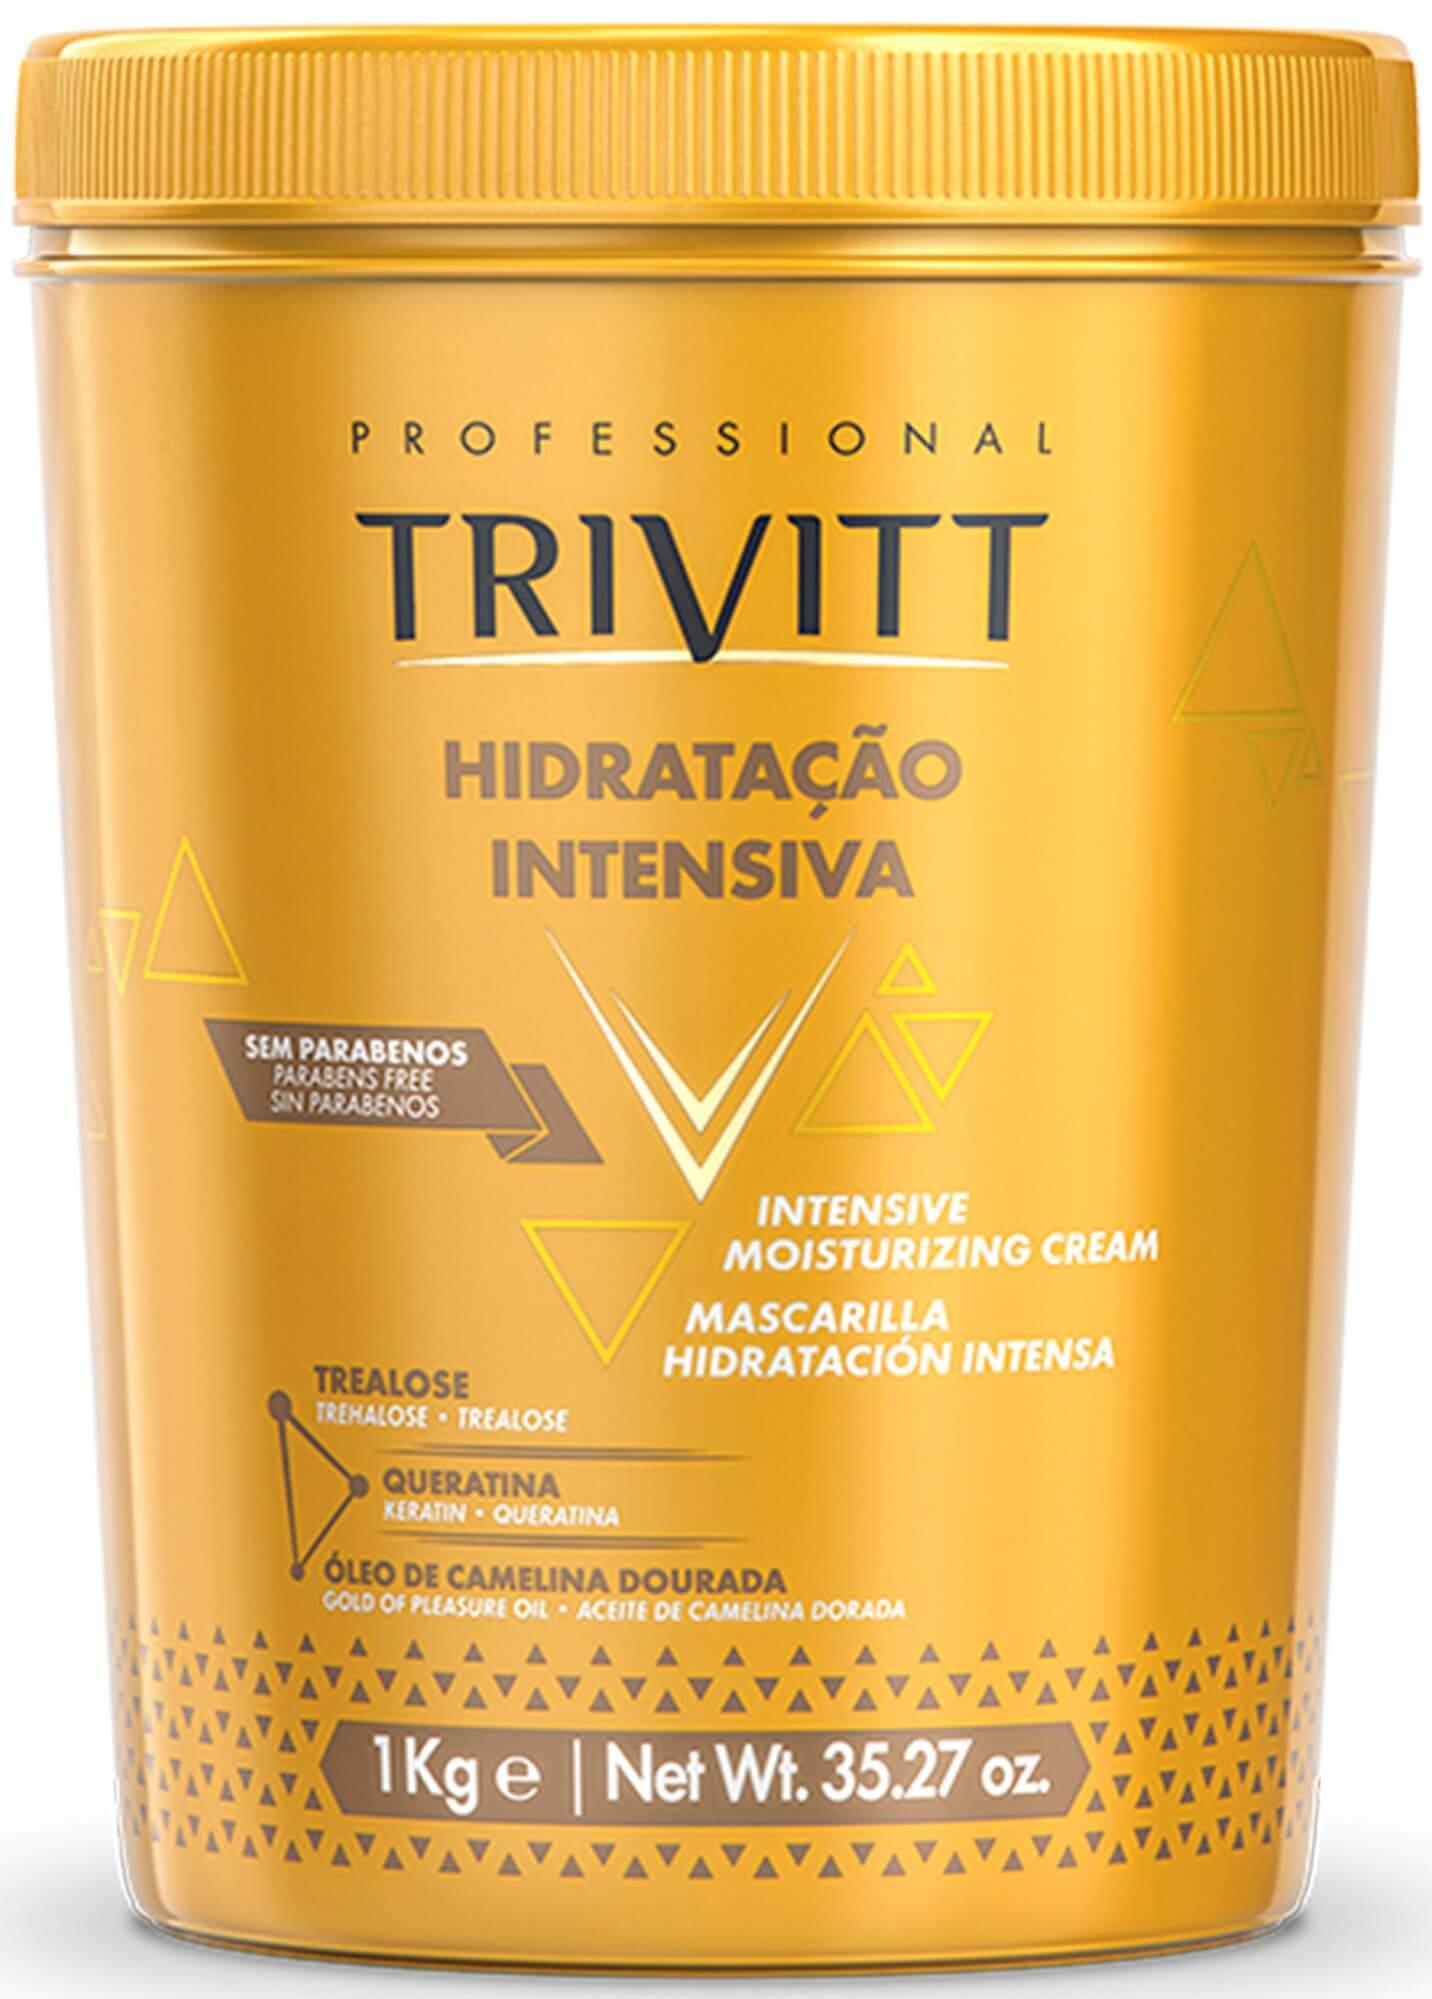 Kit Trivitt Profissional Itallian 2018 Hidratação